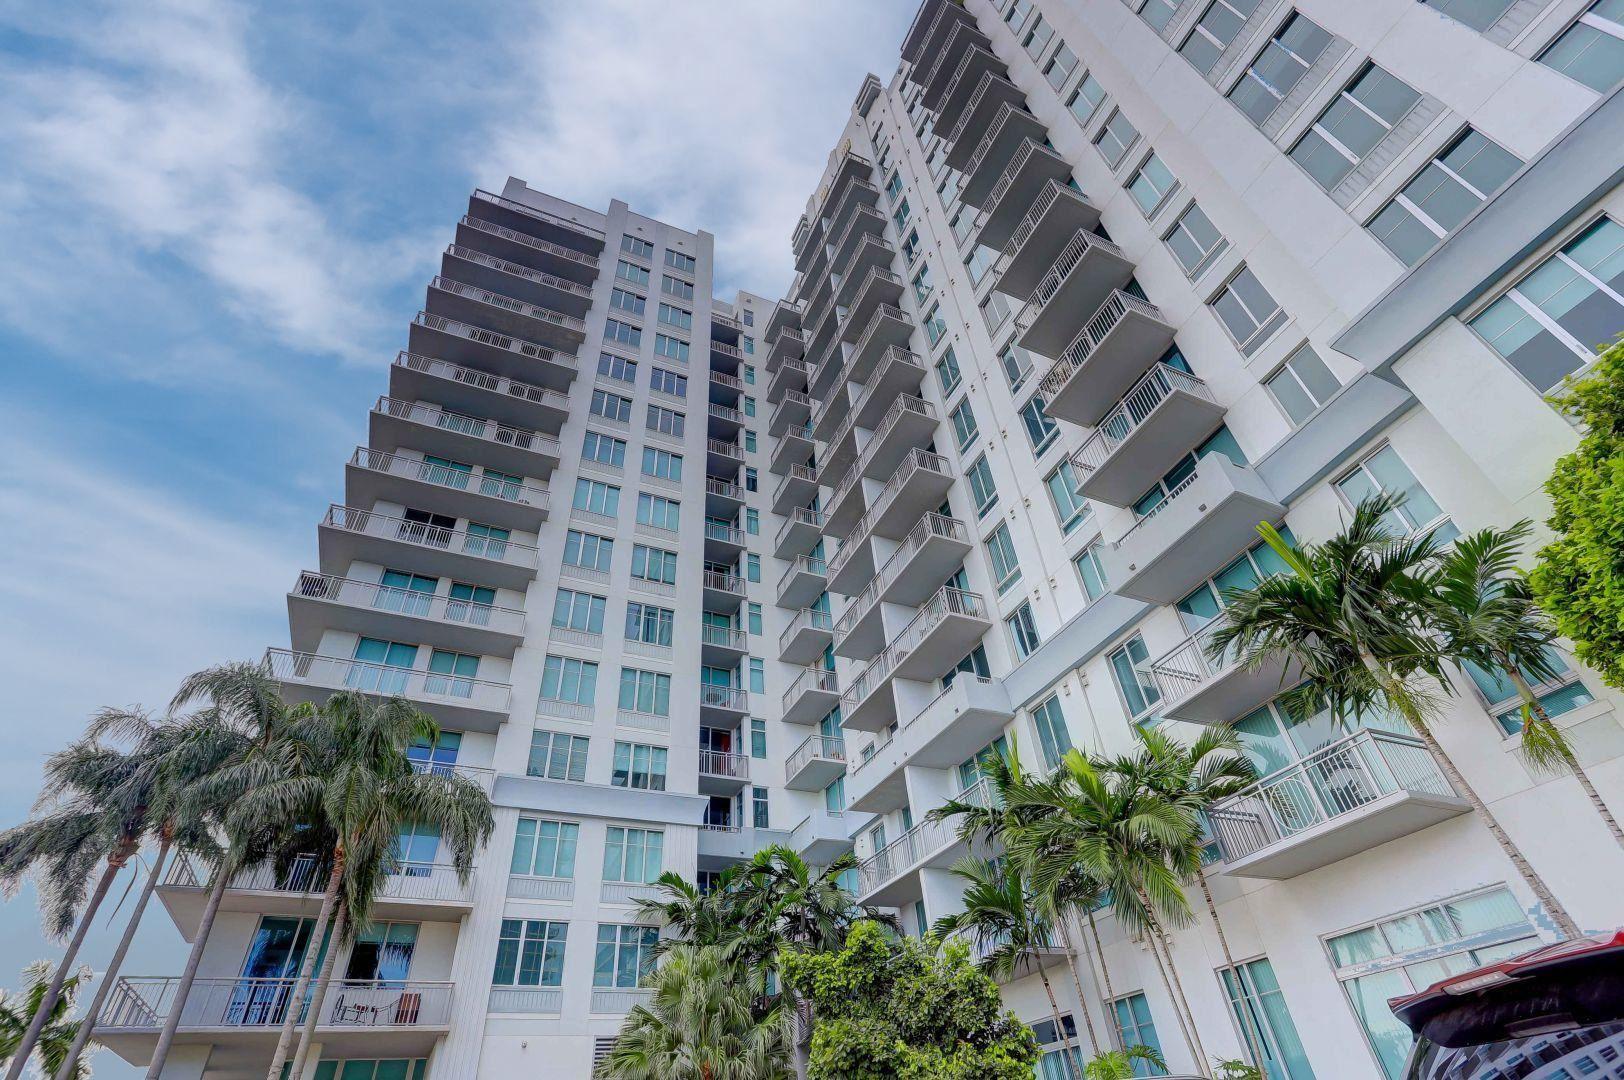 300 S Australian Avenue #1004, West Palm Beach, FL 33401 - #: RX-10579010